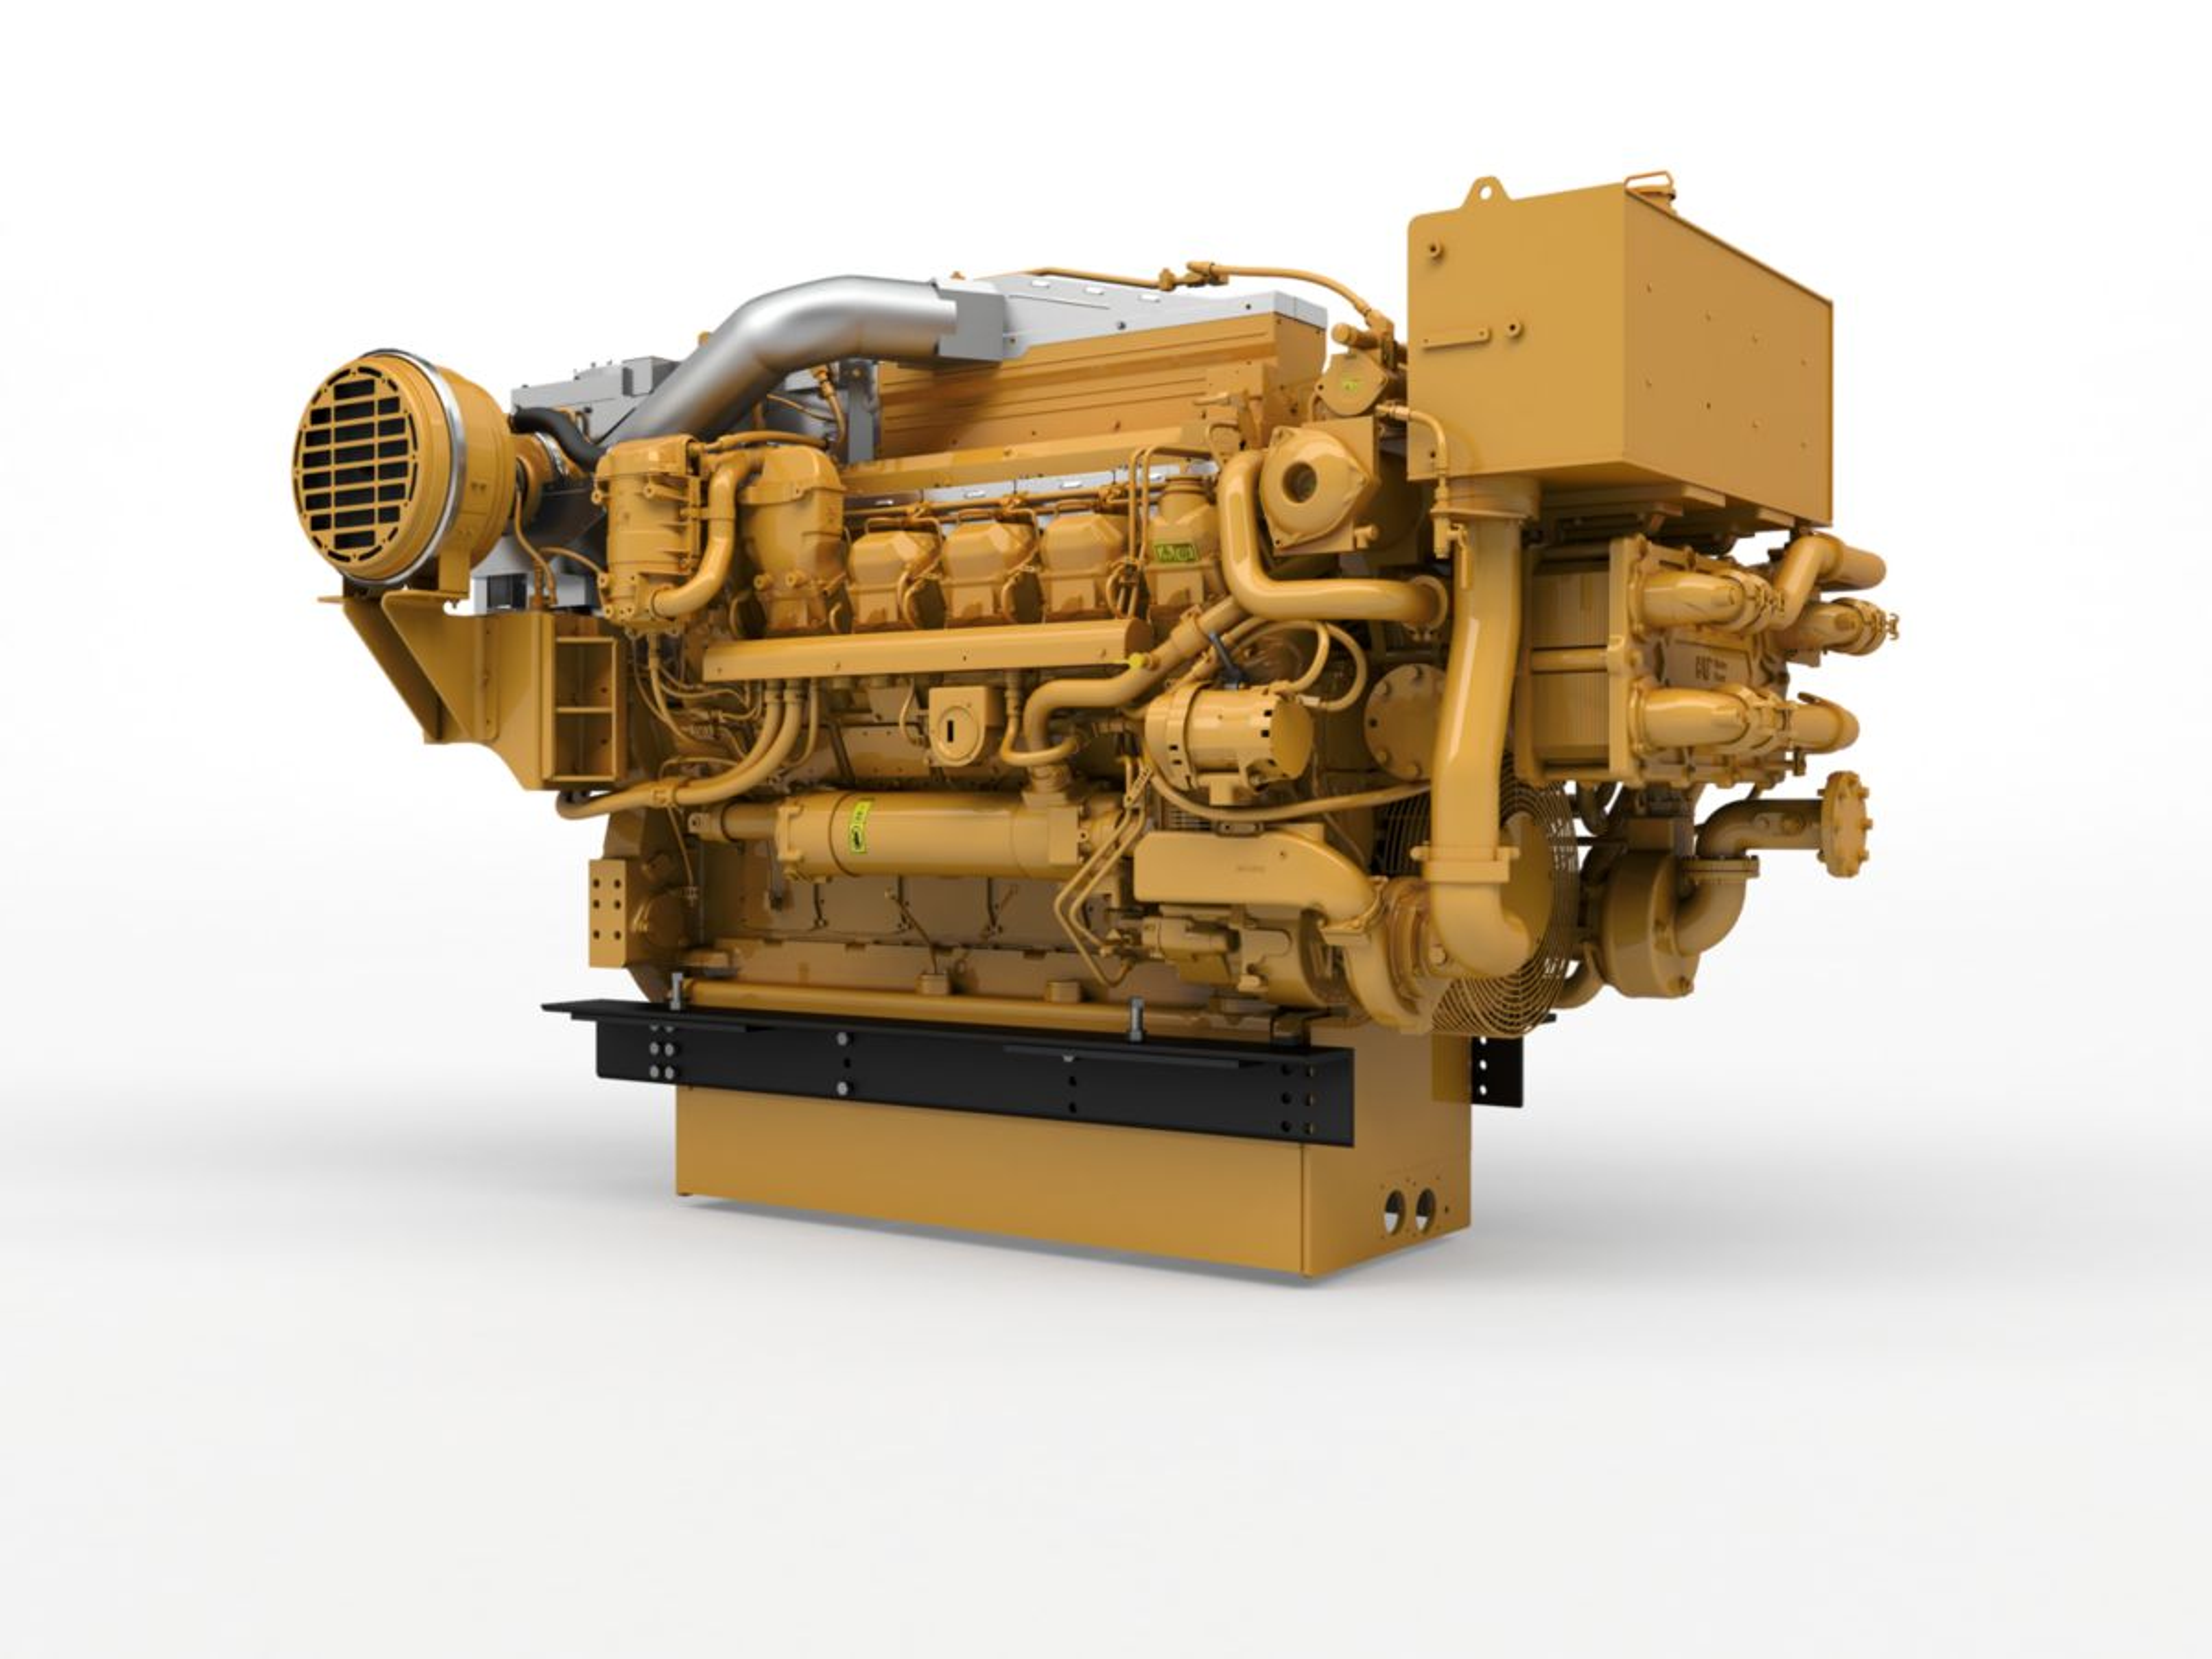 3512E Marine Propulsion Engine (U.S. EPA Tier 4 Fi